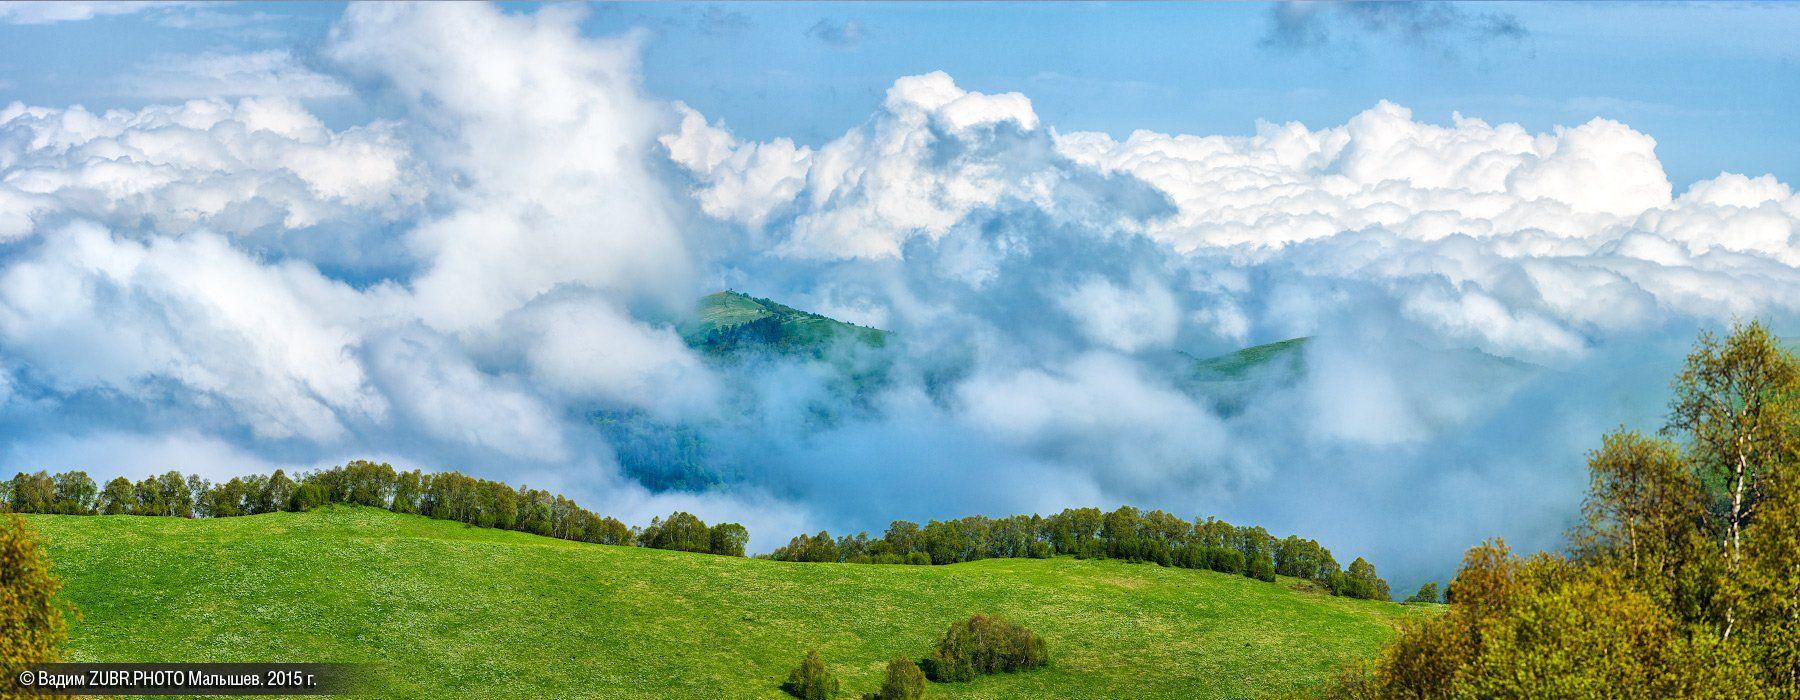 панорама, пейзаж, горы, заповедник, лето, облака, zubrphoto, Вадим ZUBR Малышев